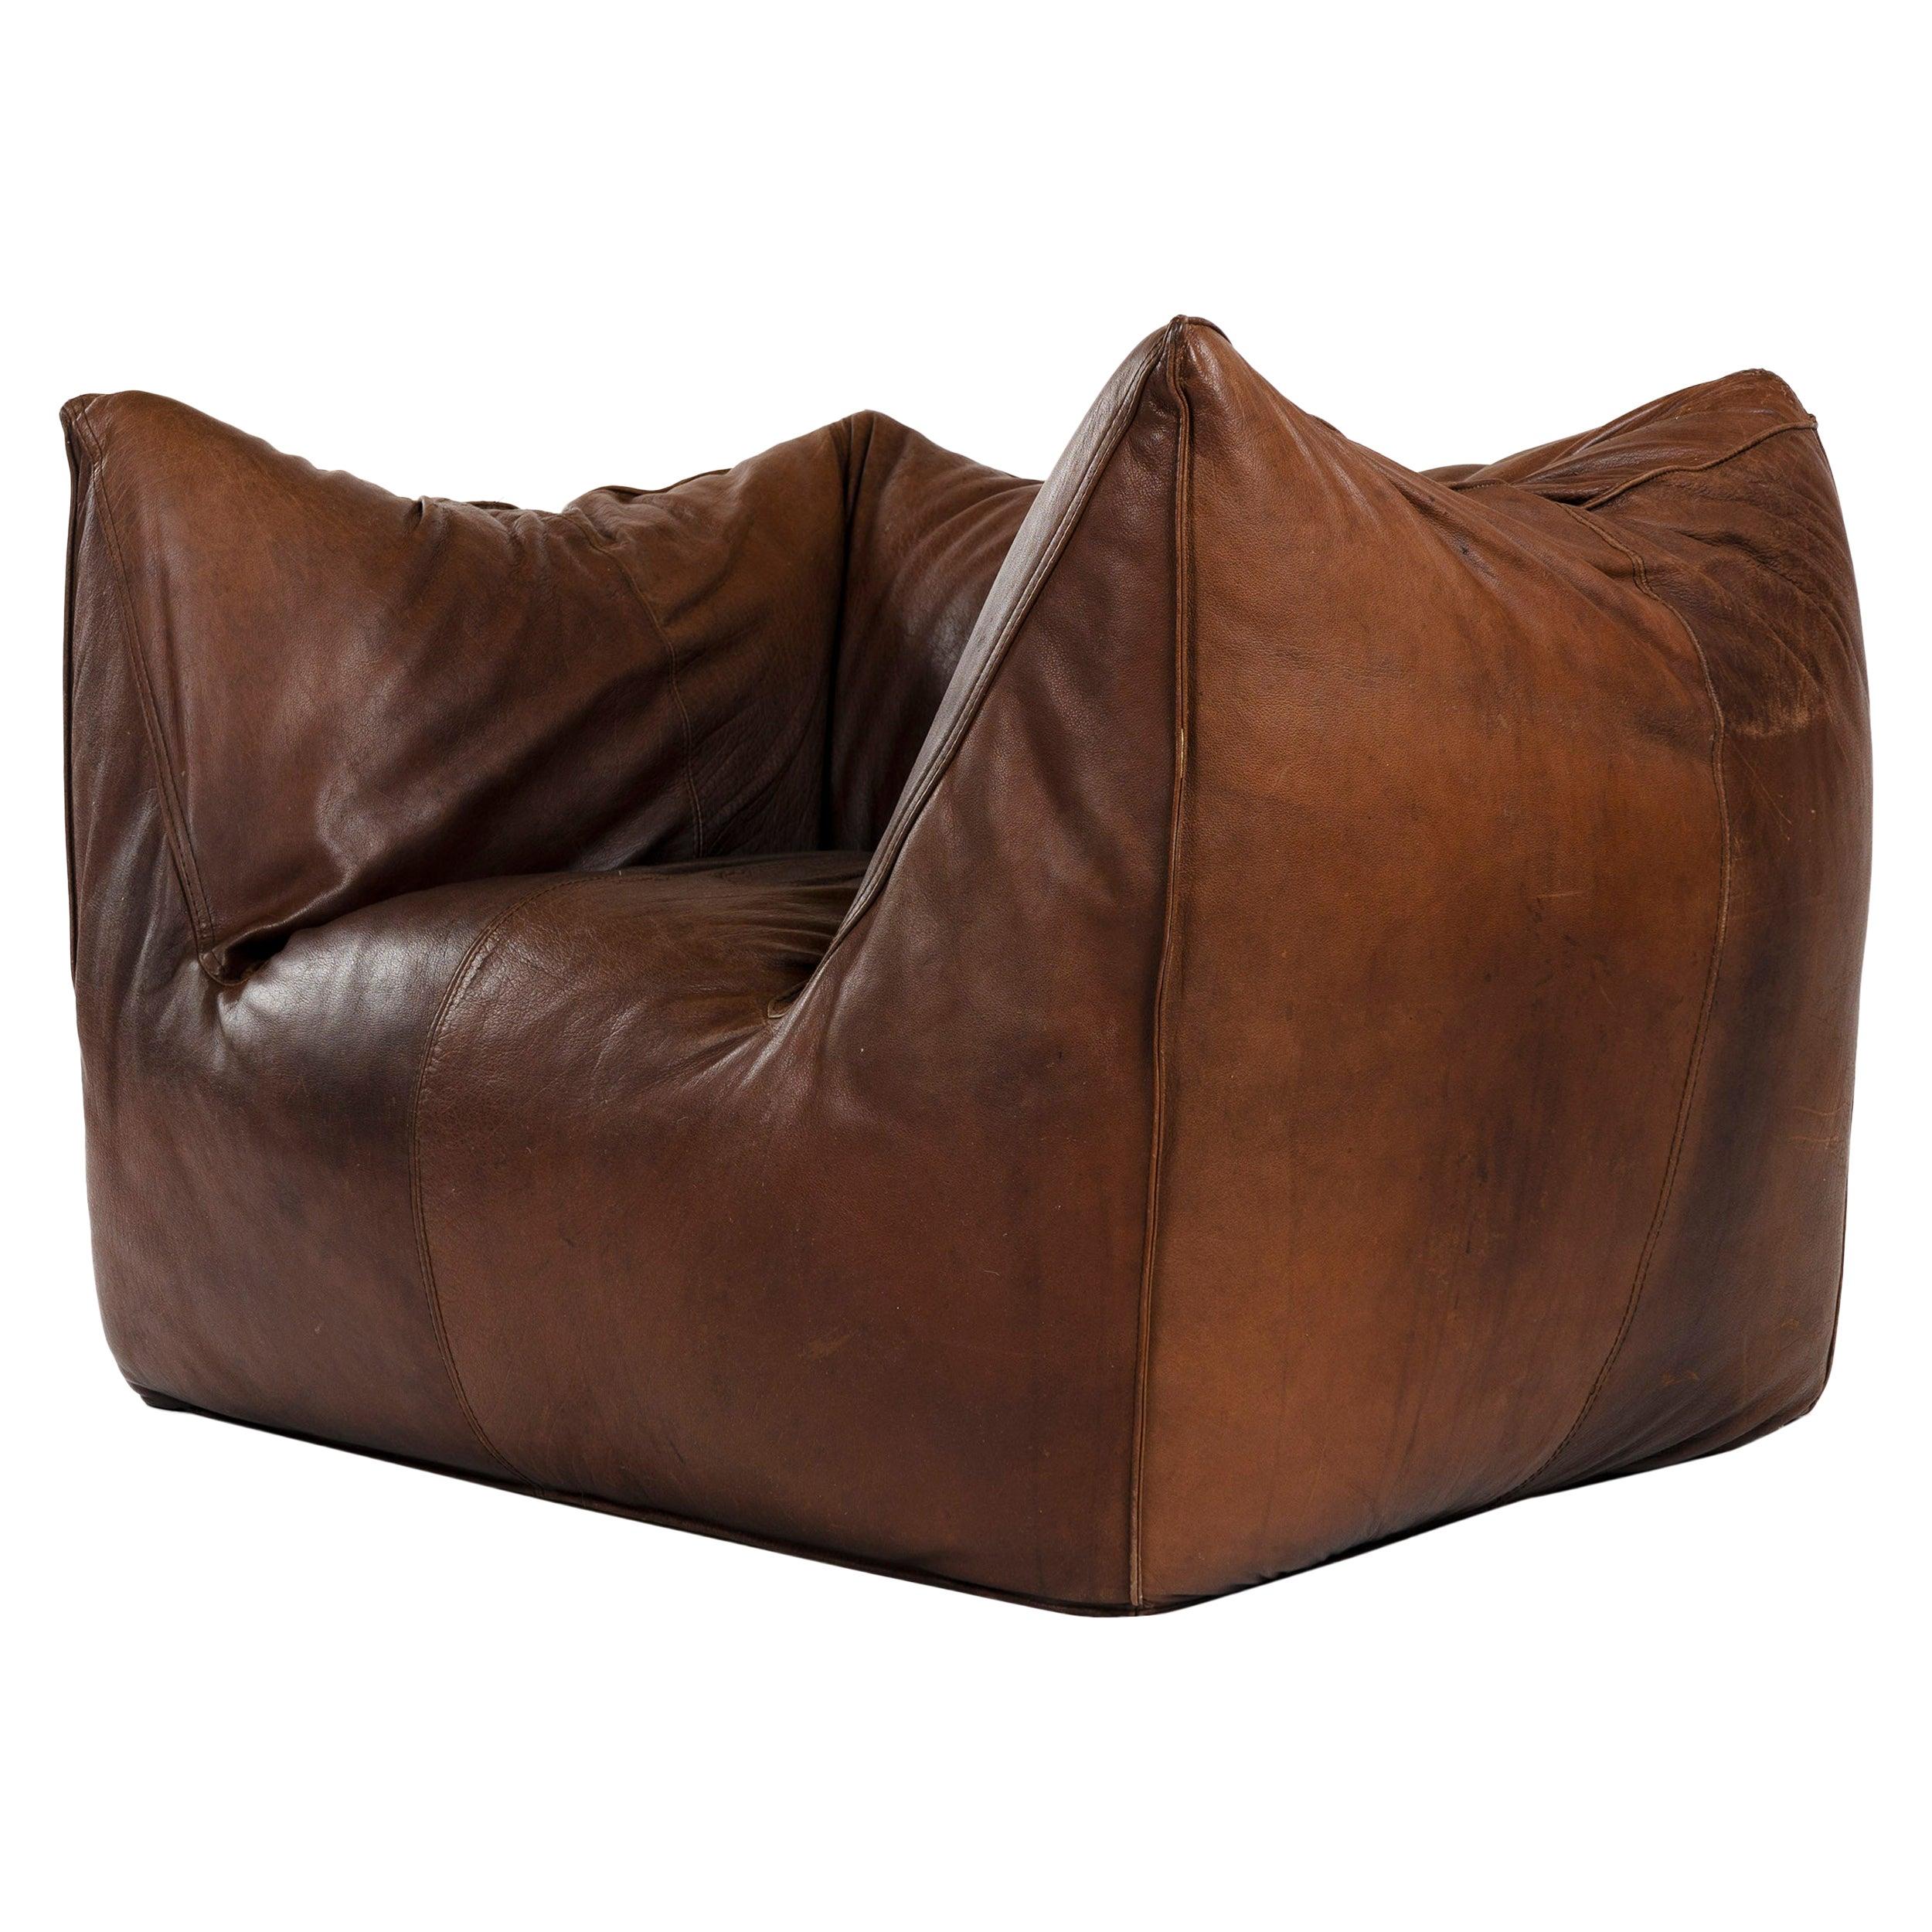 1970s Le Bambole Lounge Chair by Mario Bellini for B&B Italia